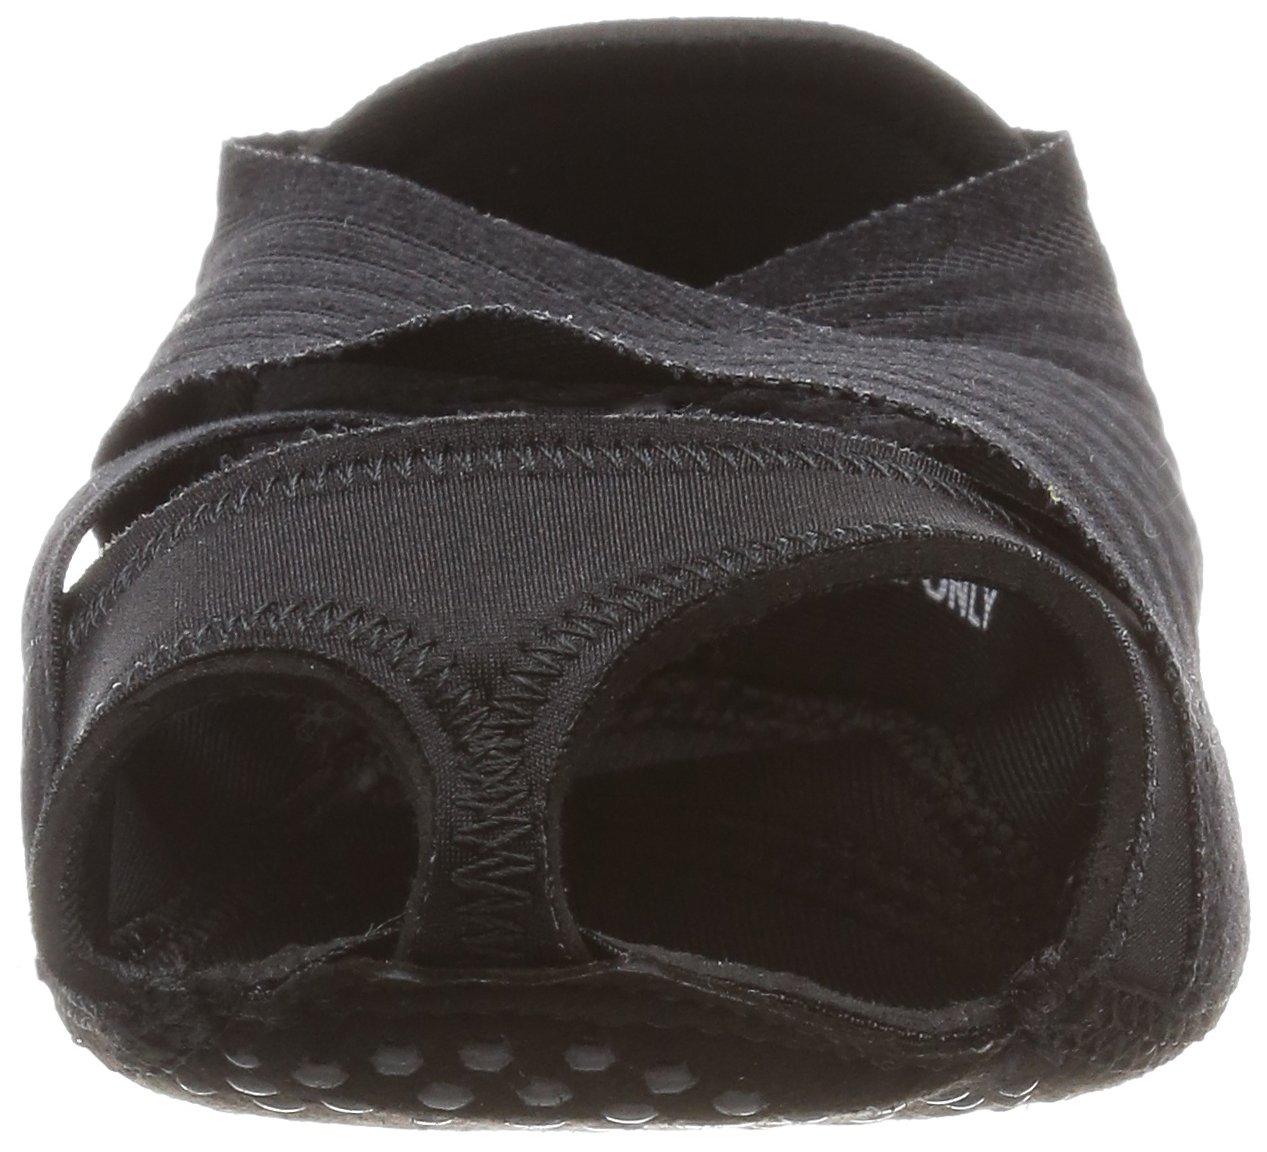 Nike Women`s Studio Wrap 4 Training Shoe B00SICEPJ4 6 B(M) US|Black/Black